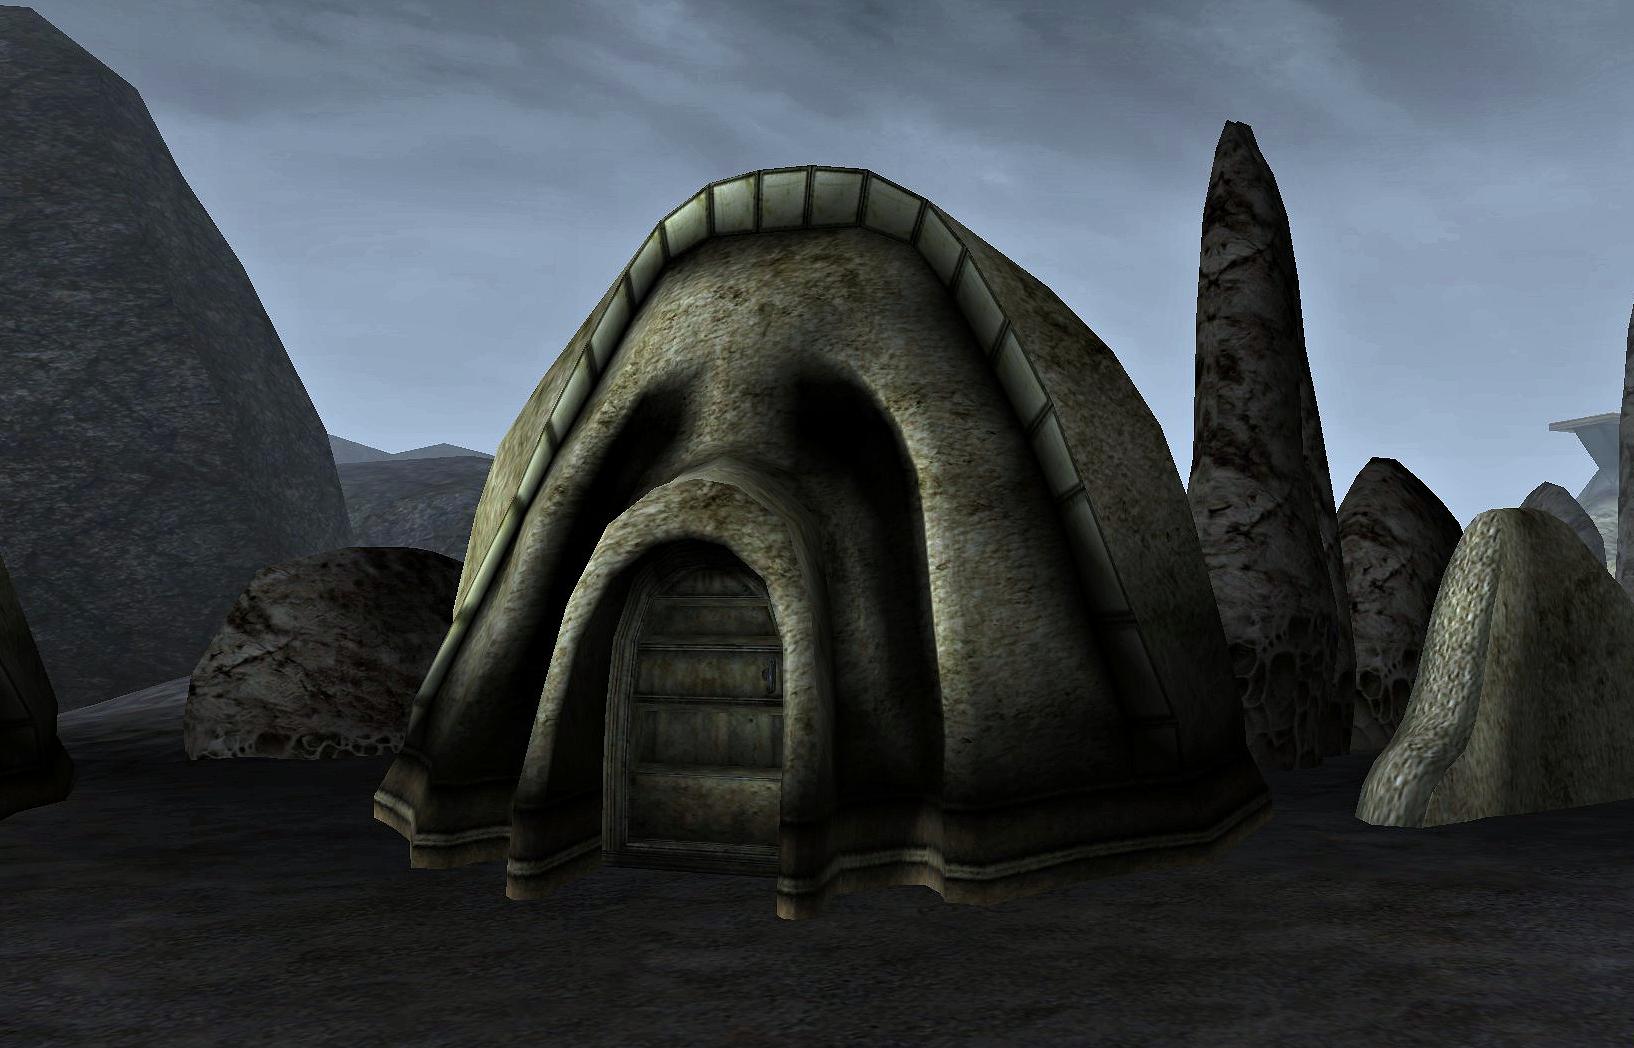 Ilmiril's House